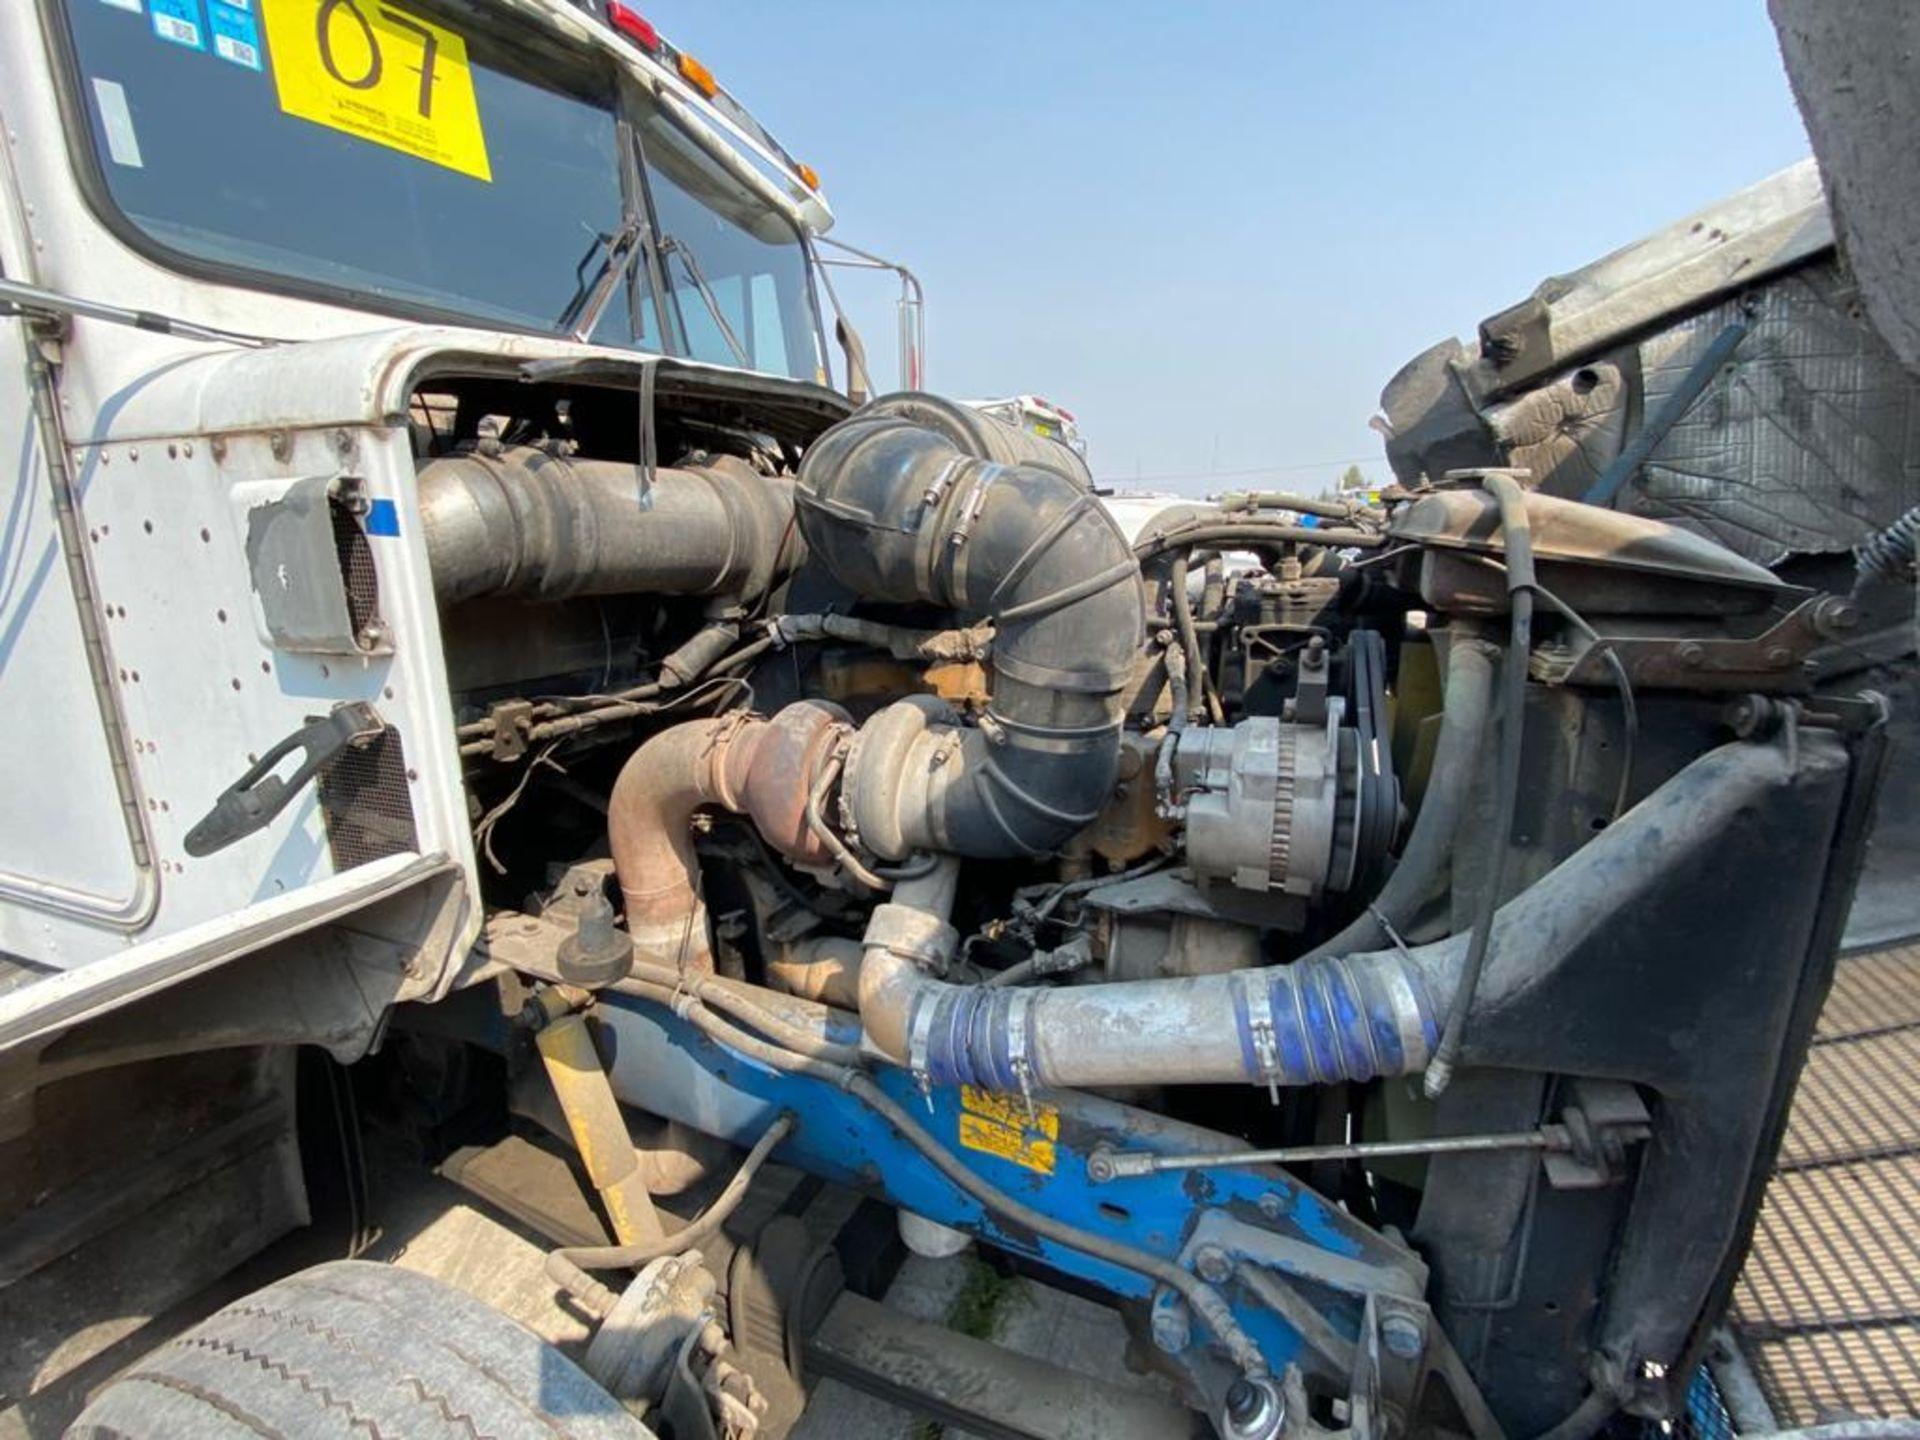 1999 Kenworth Sleeper truck tractor, standard transmission of 18 speeds - Image 66 of 72